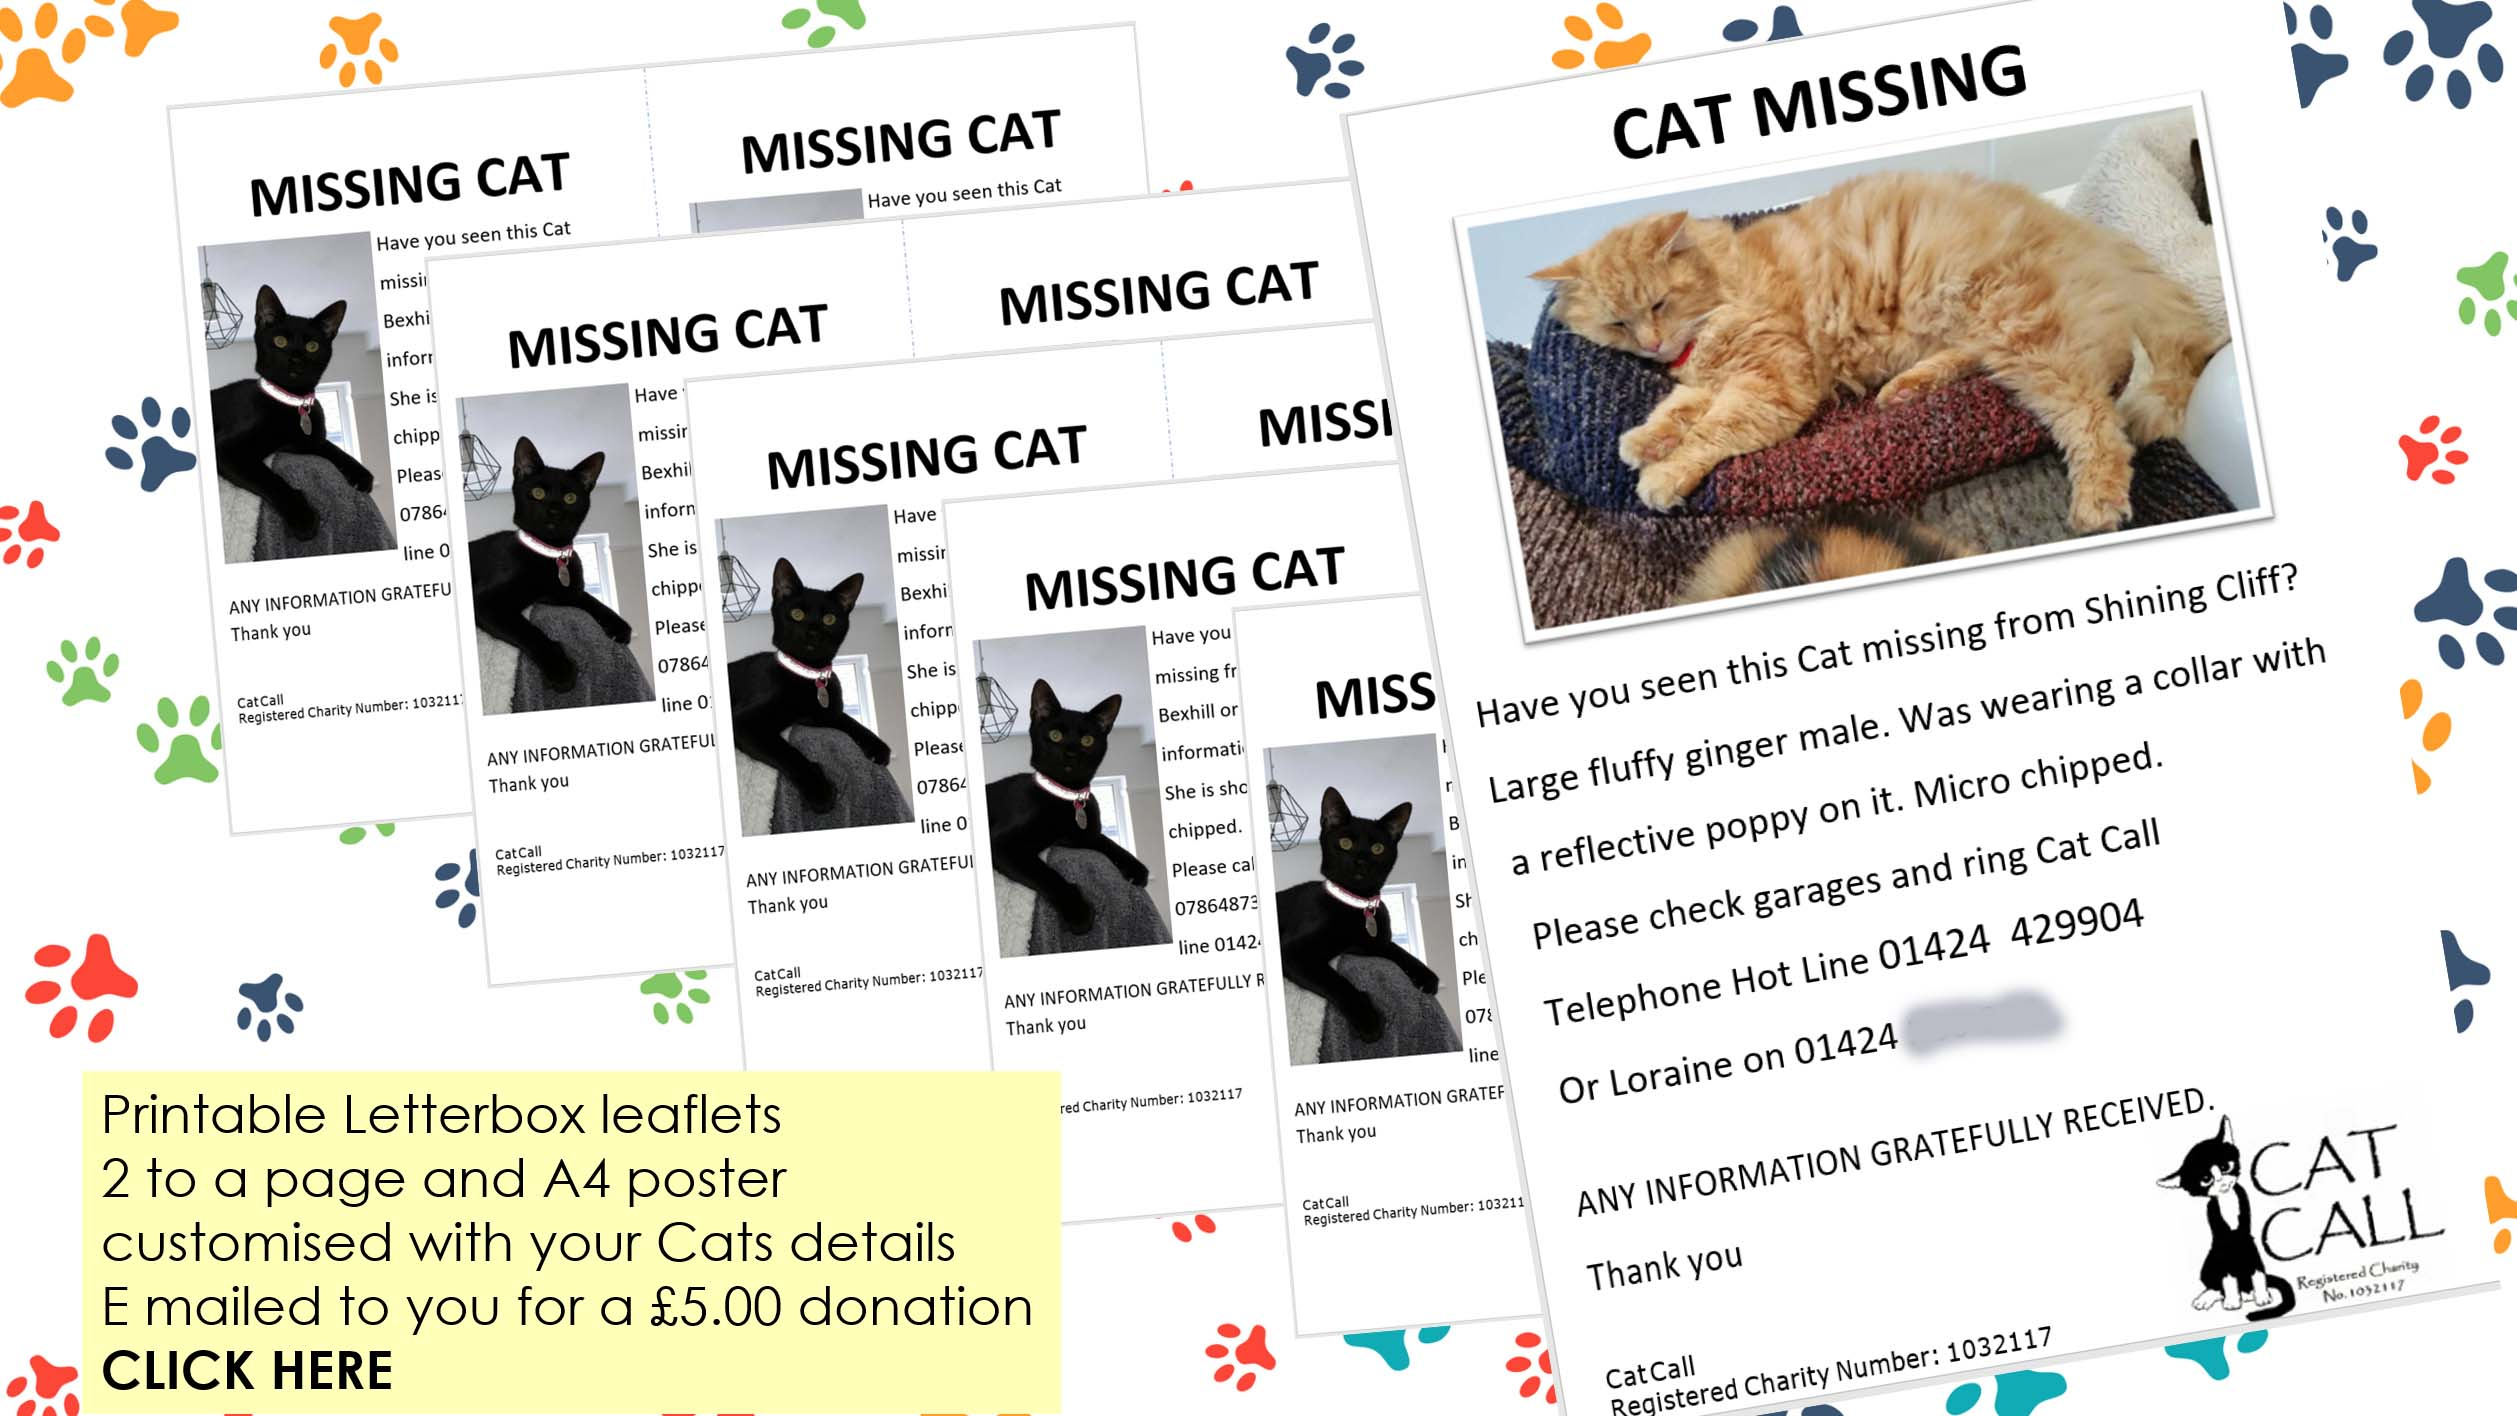 Cat Lost Cat leaflets